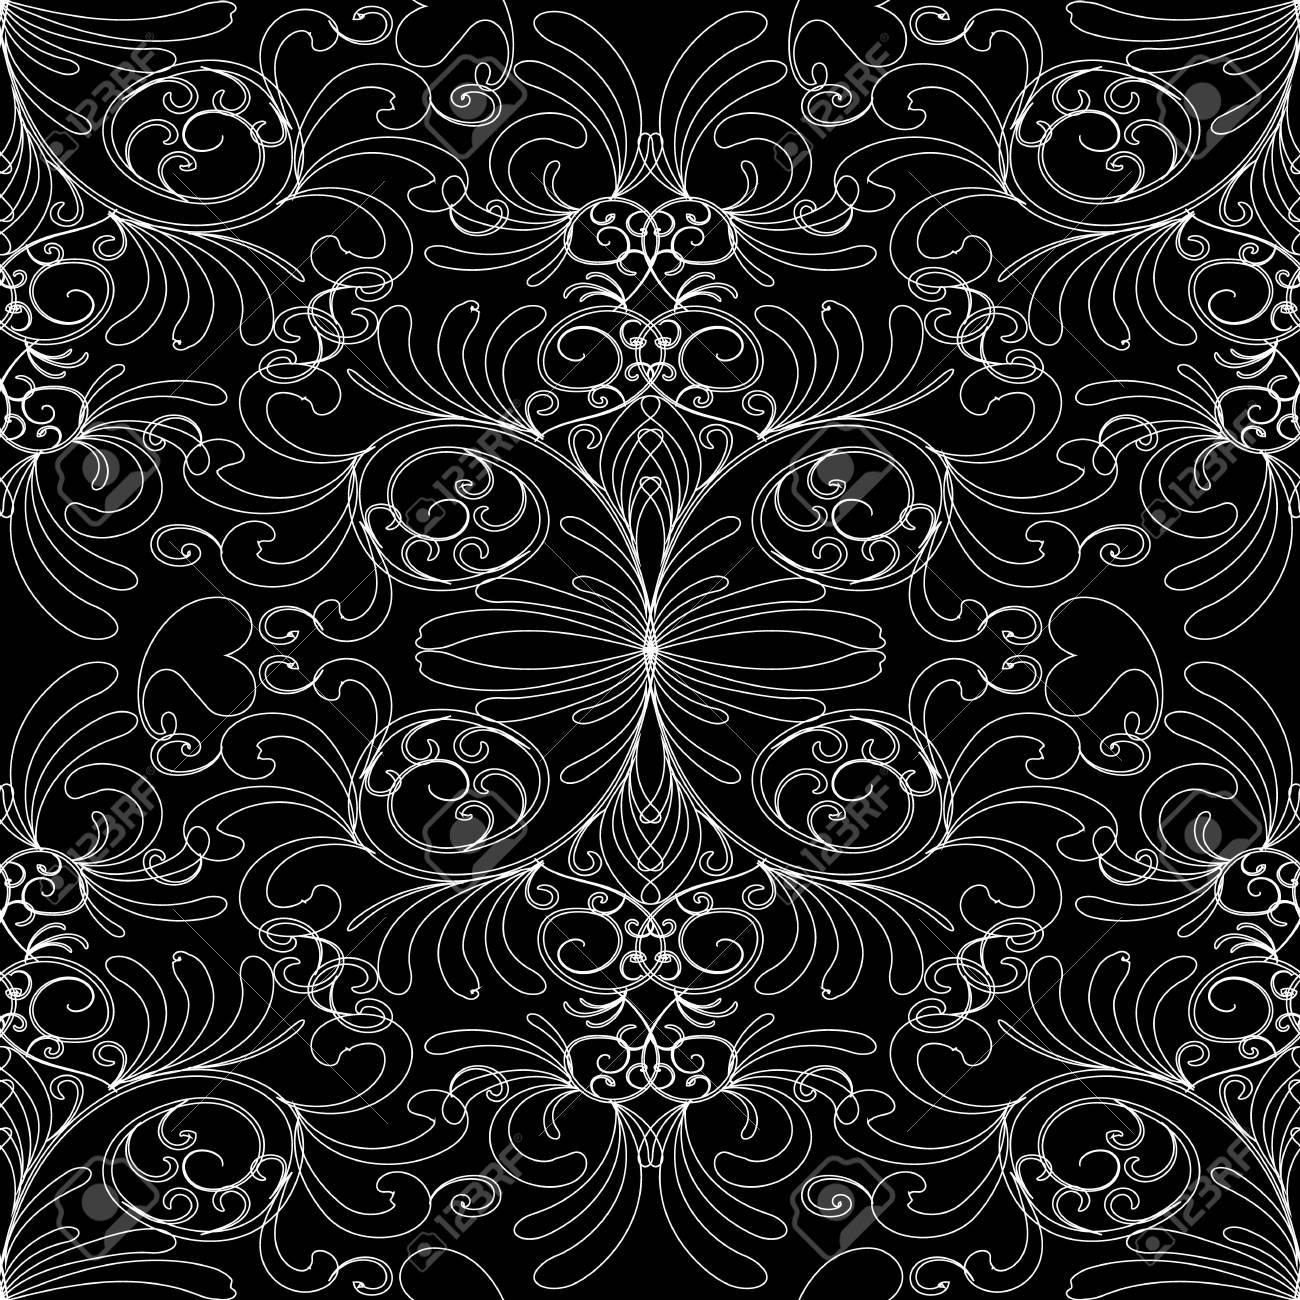 Damask Vintage Black White Background Ornate Wallpaper Decorative Hand Drawn